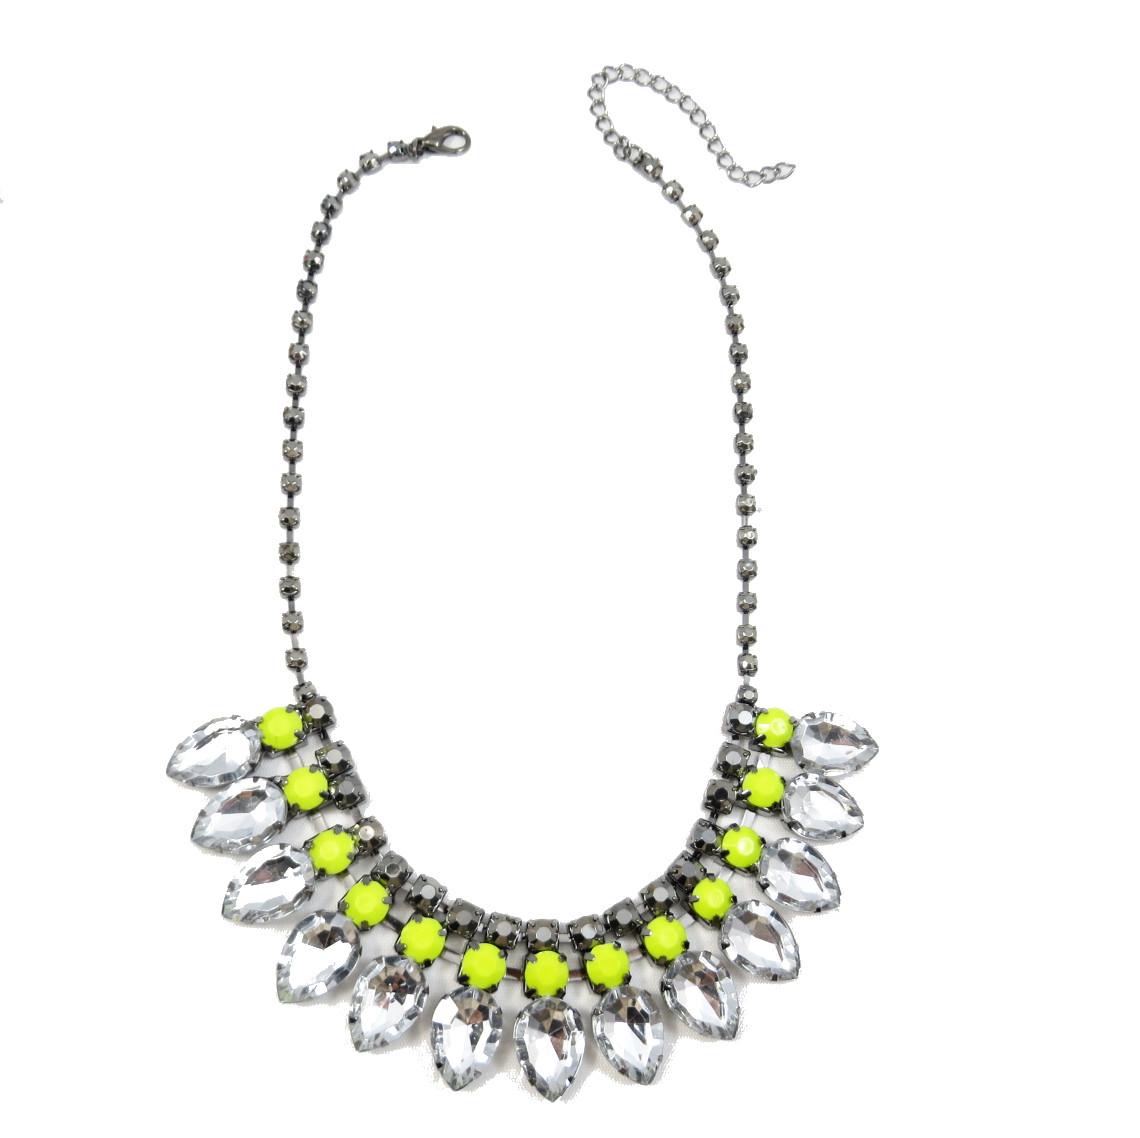 Neon Yellow Teardrop Diamante Bib Statement Necklace